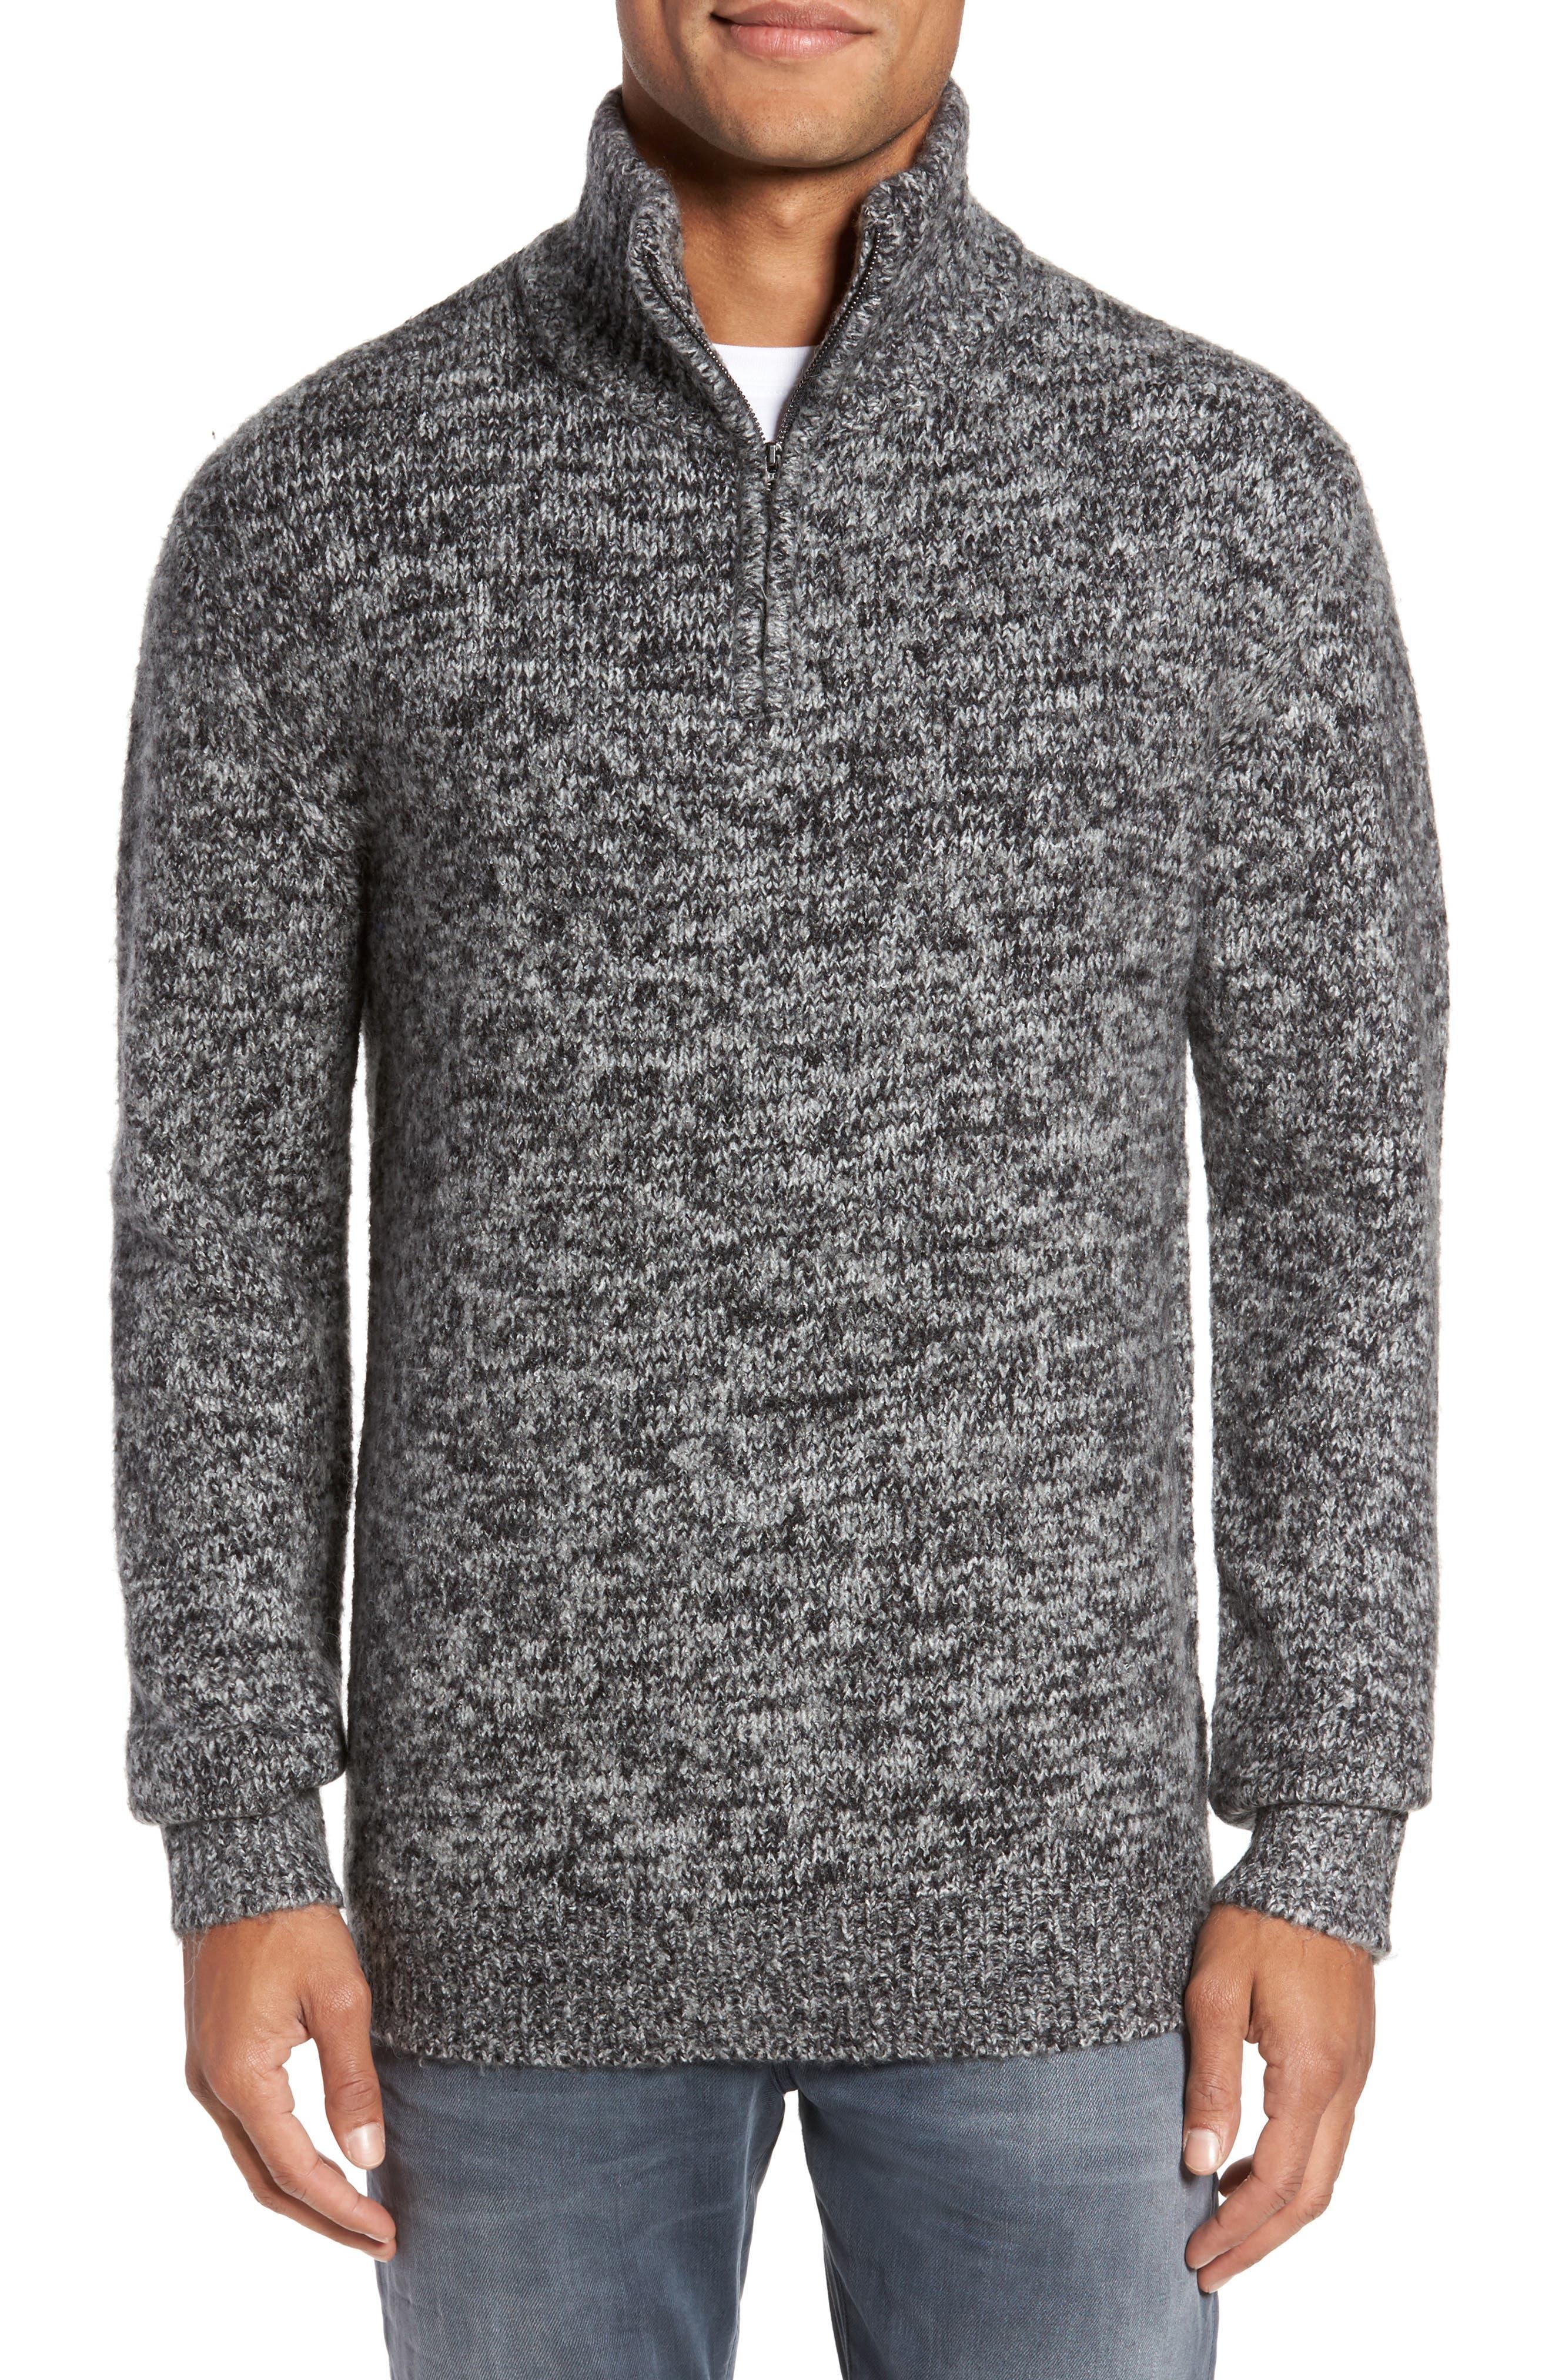 Quarter Zip Knit Pullover,                         Main,                         color, Charcoal/ Black